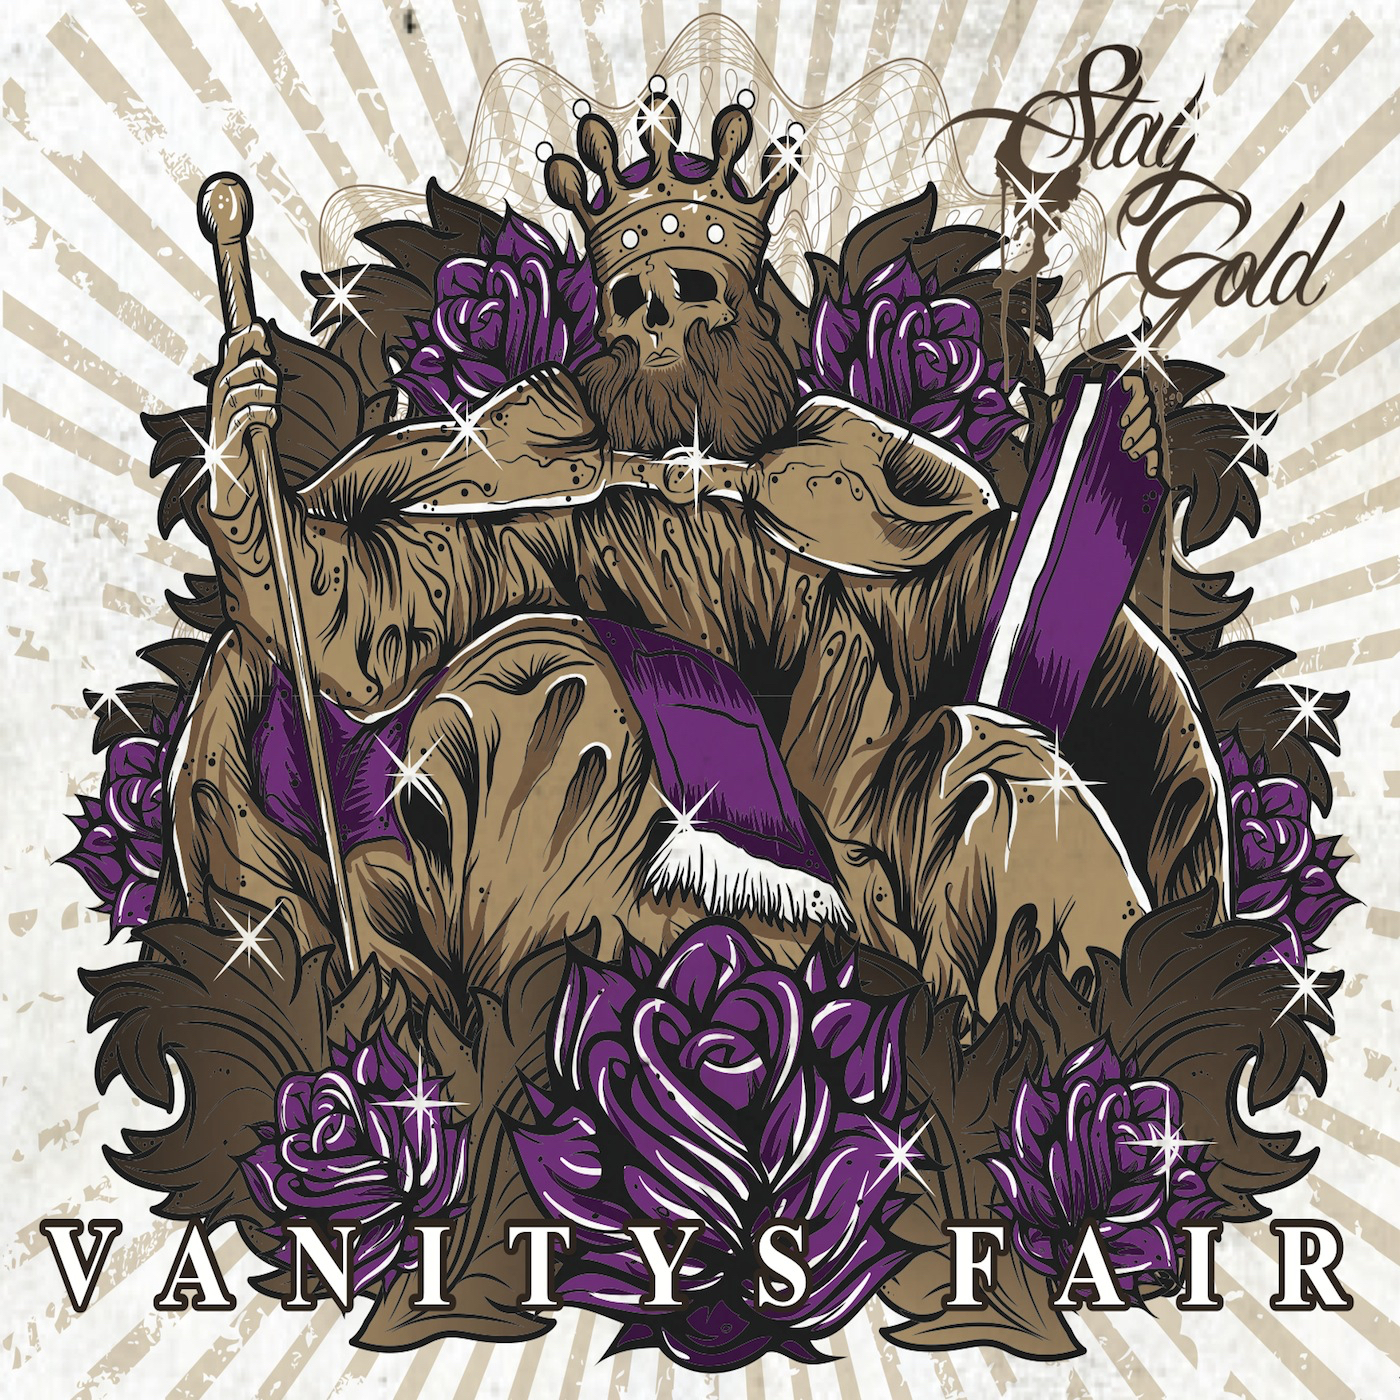 Vanitys Fair - Stay Gold (2011)